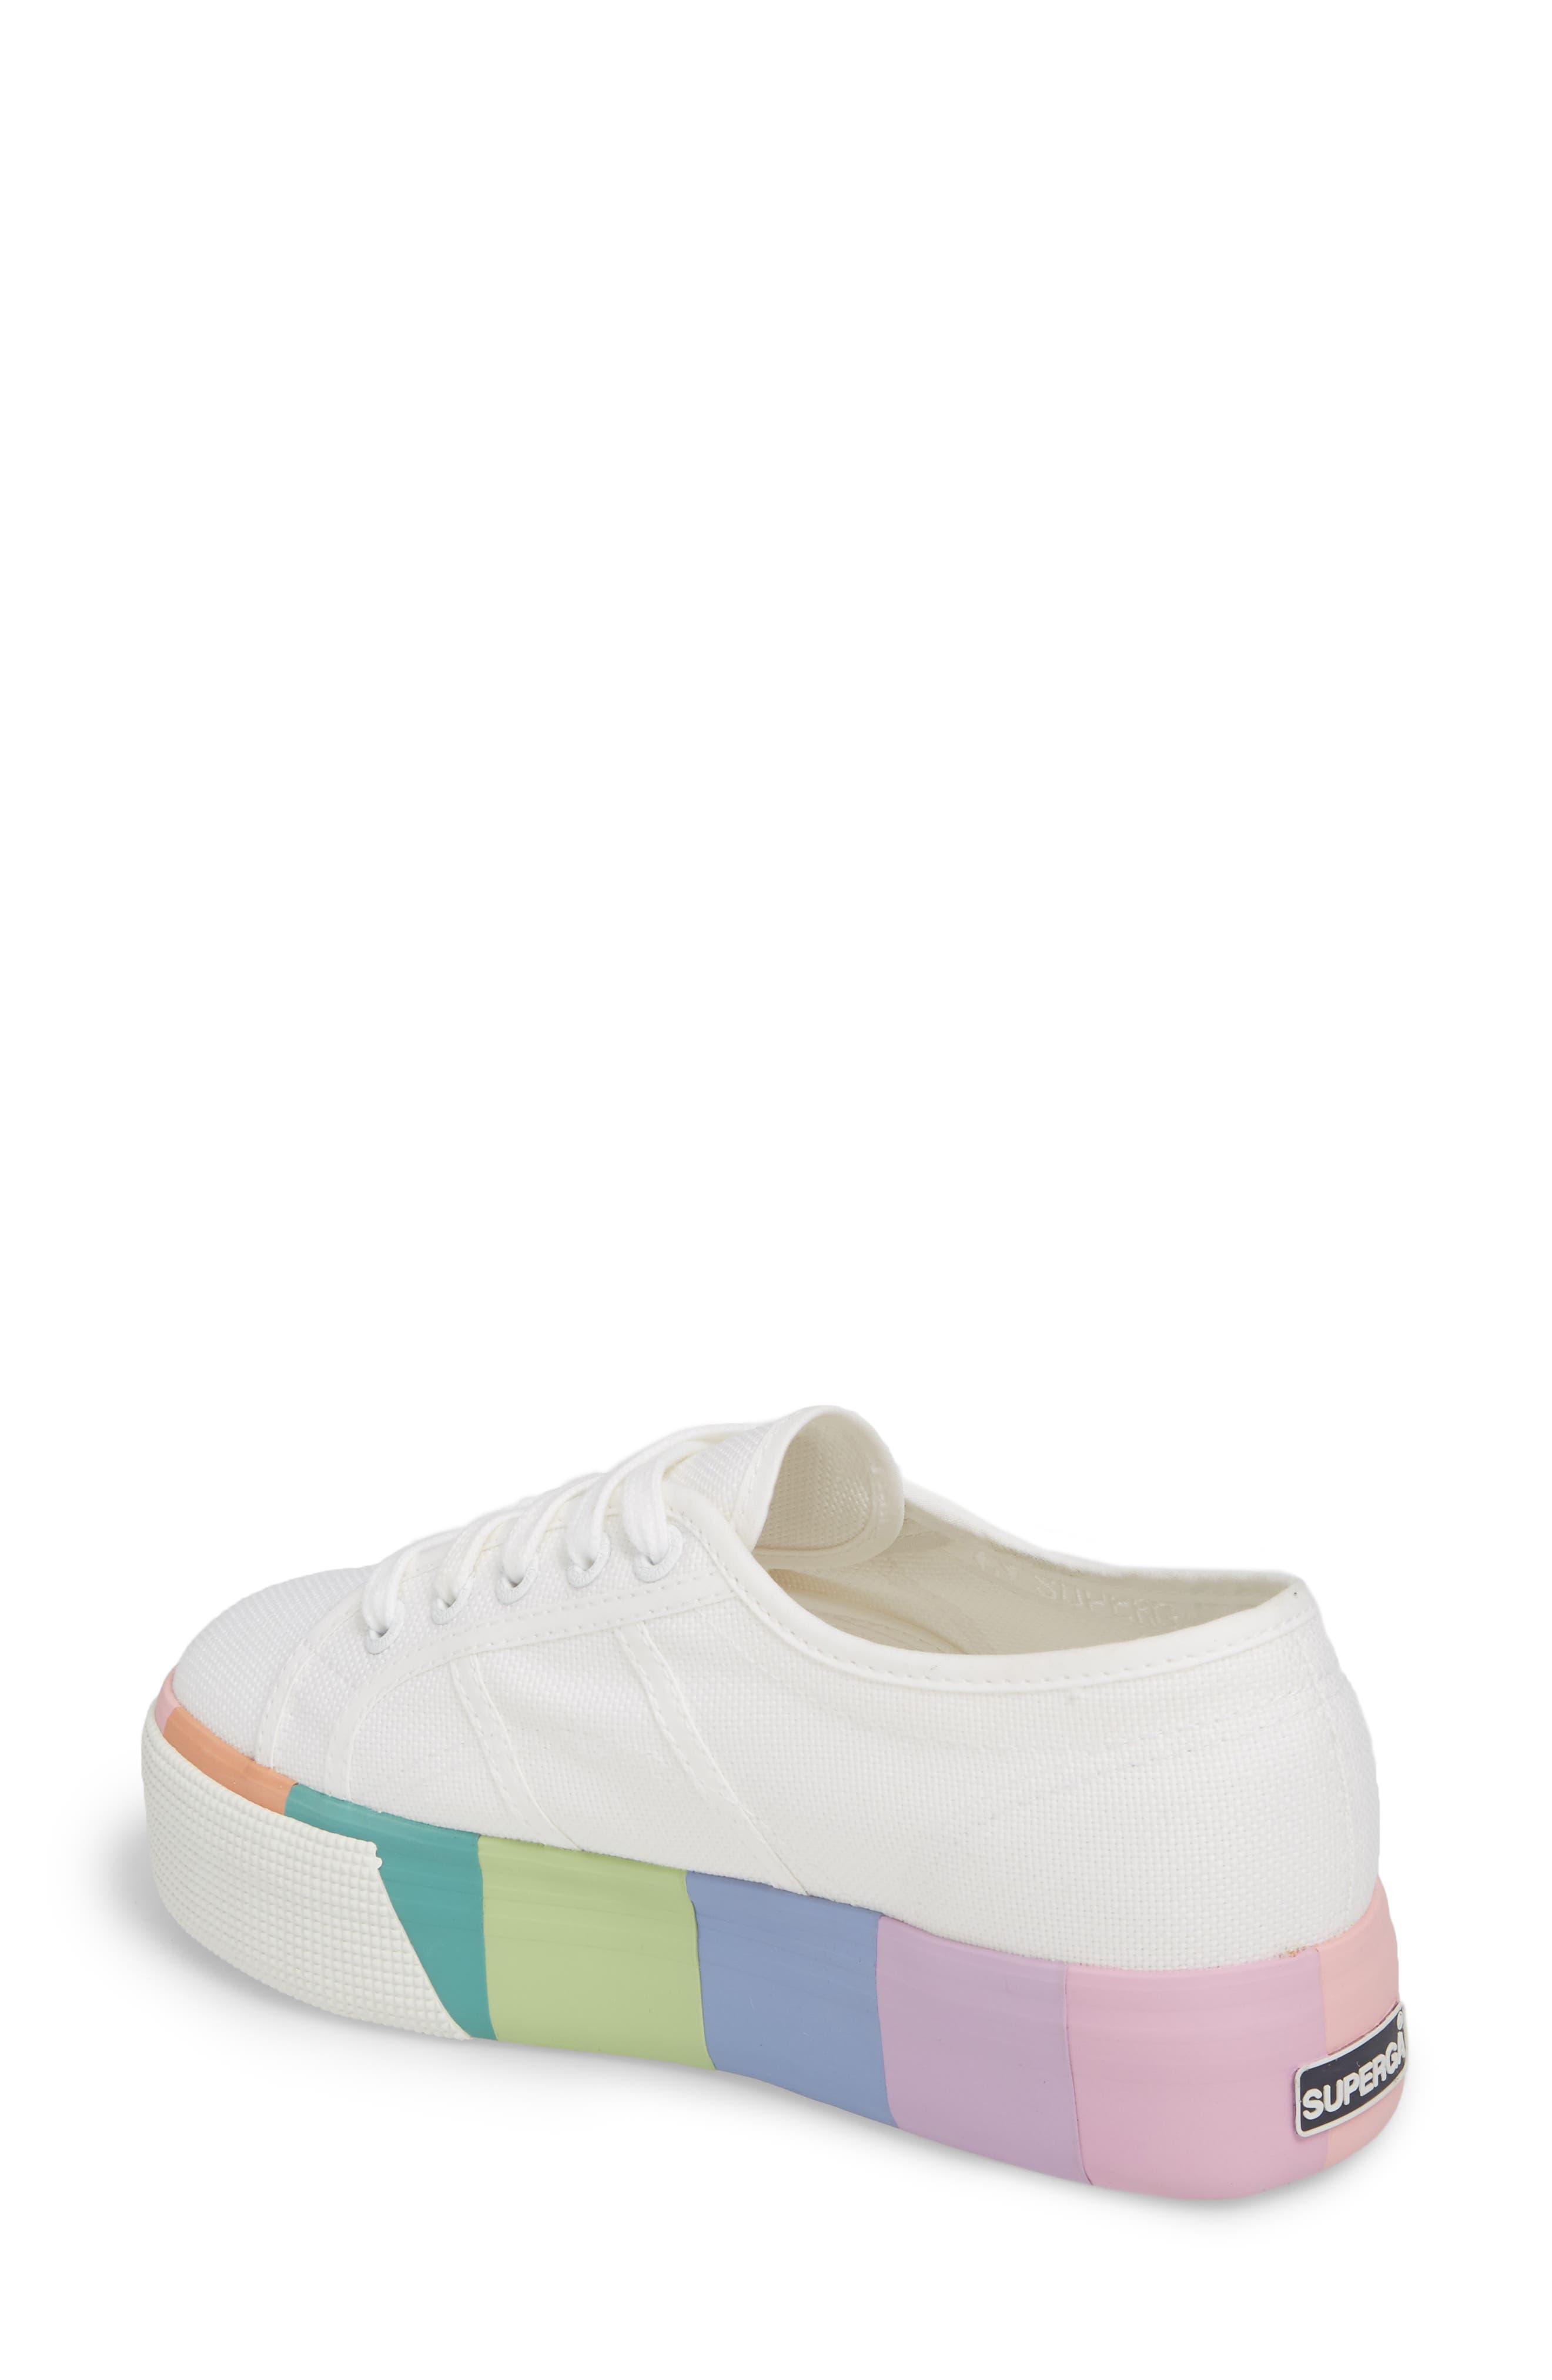 2790 Platform Sneaker,                             Alternate thumbnail 2, color,                             100